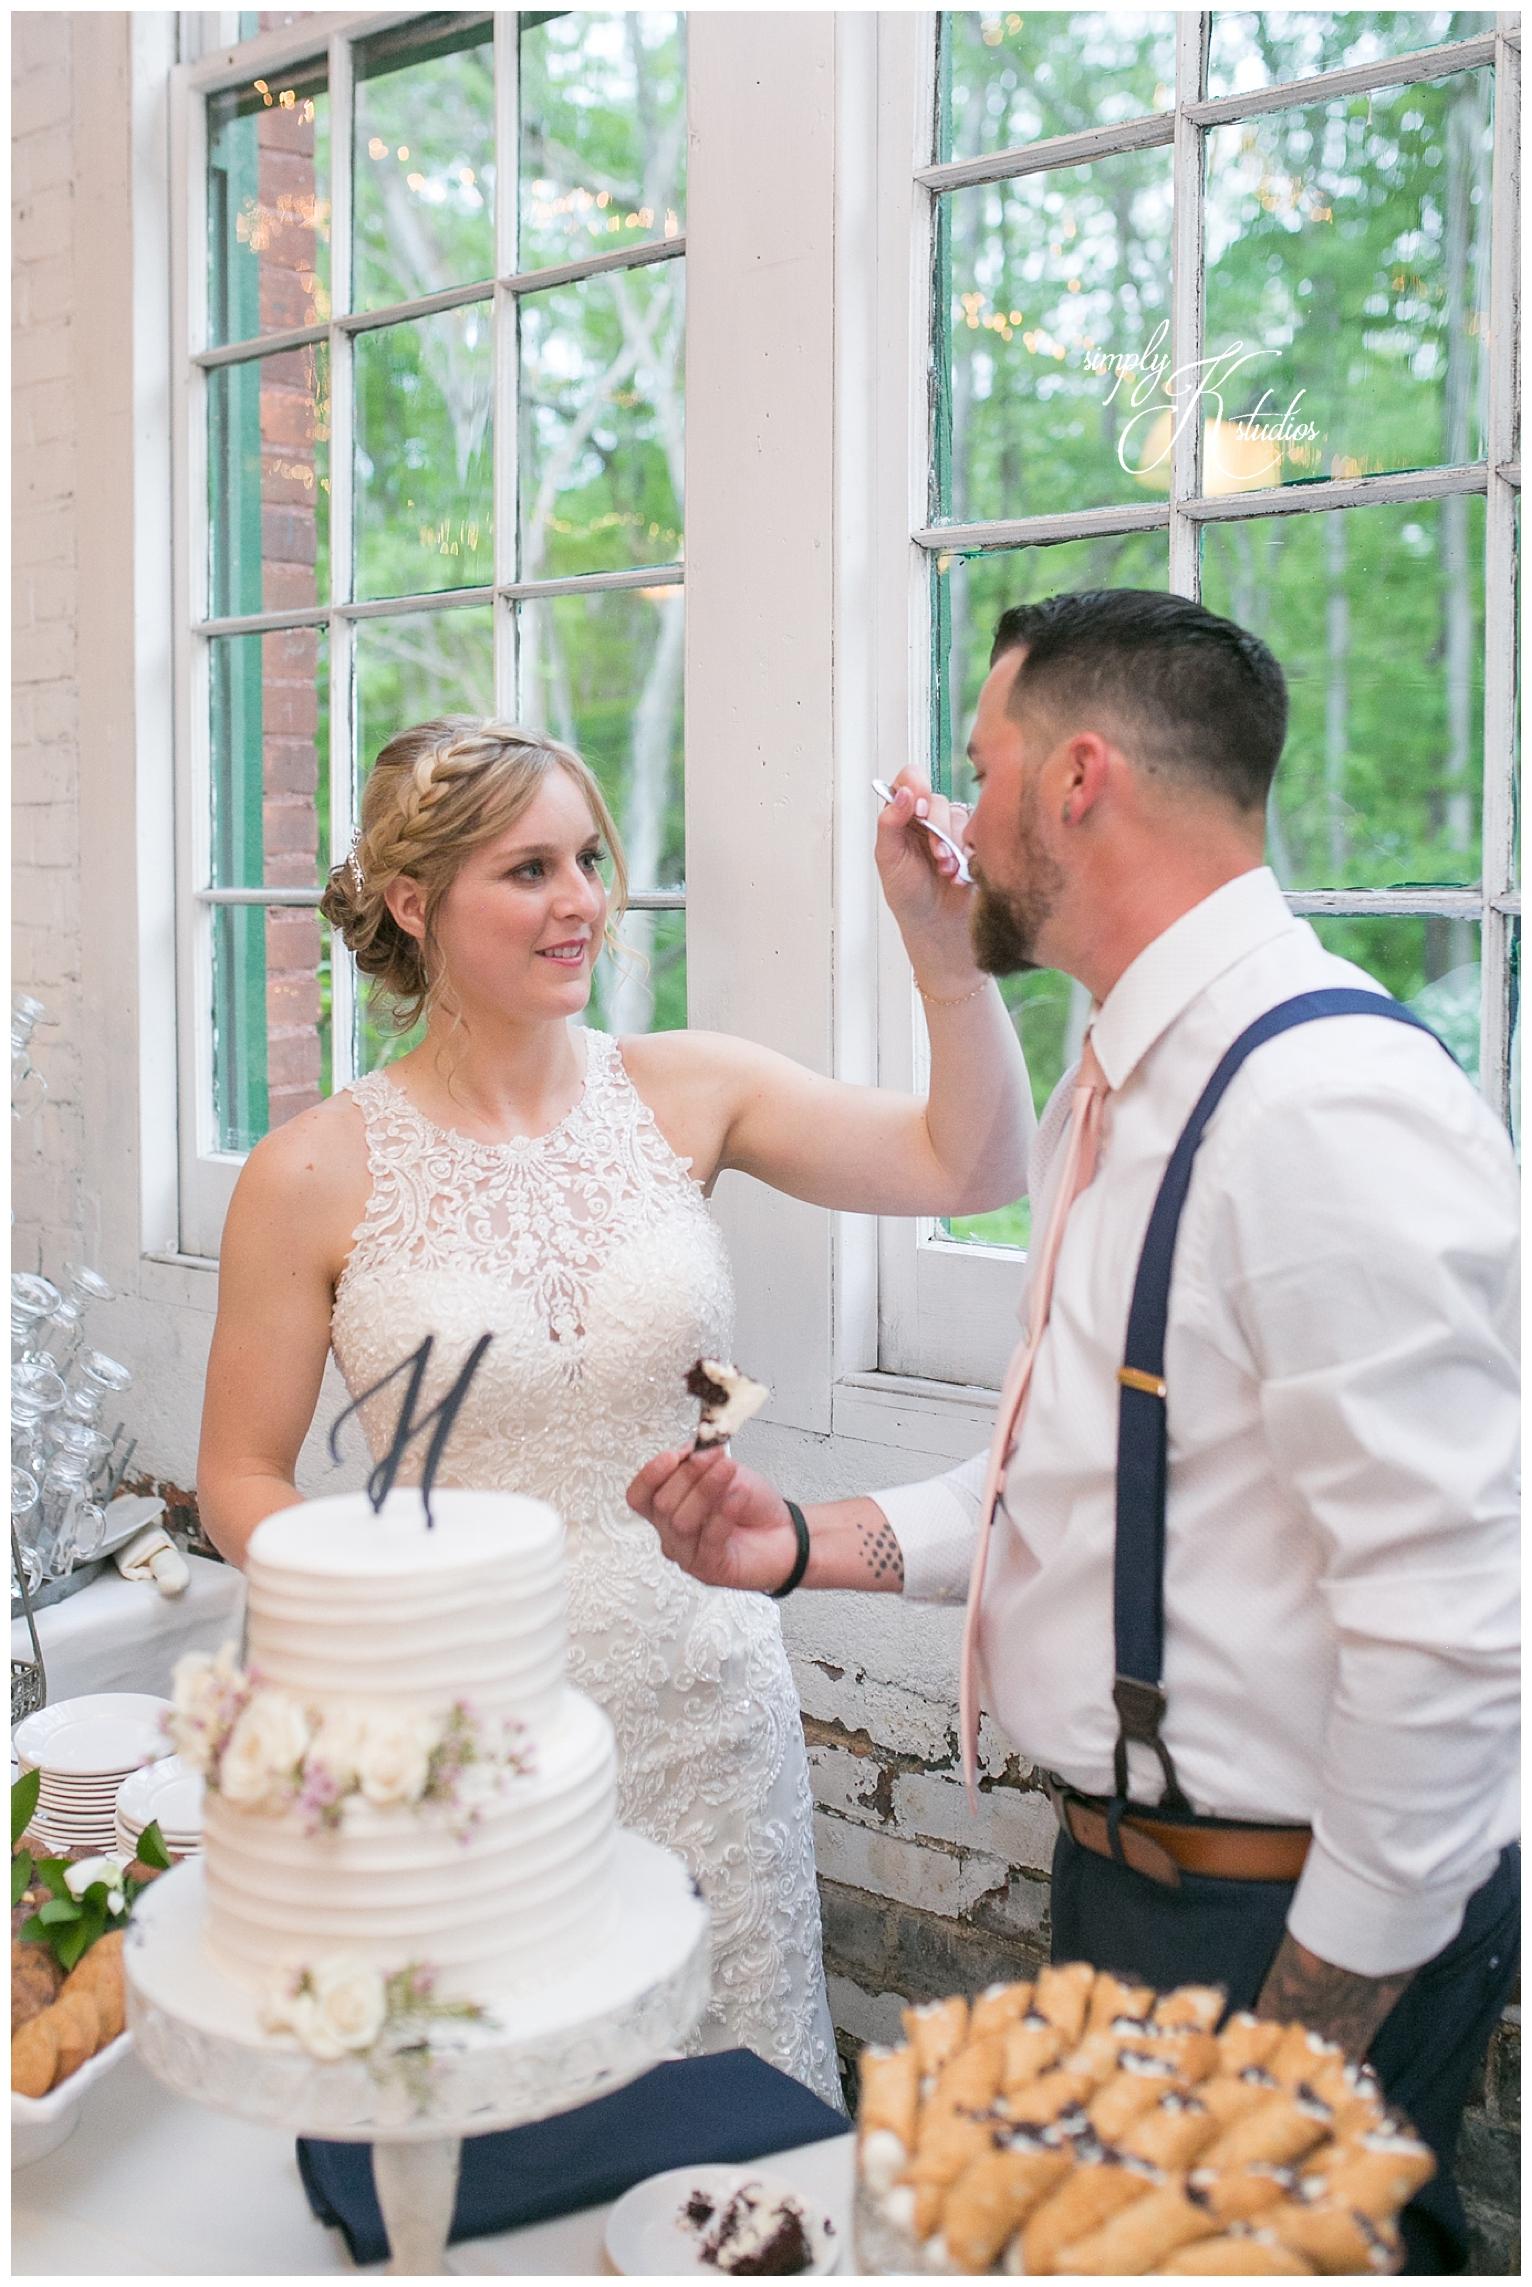 Bakeries in CT for Wedding Cakes.jpg